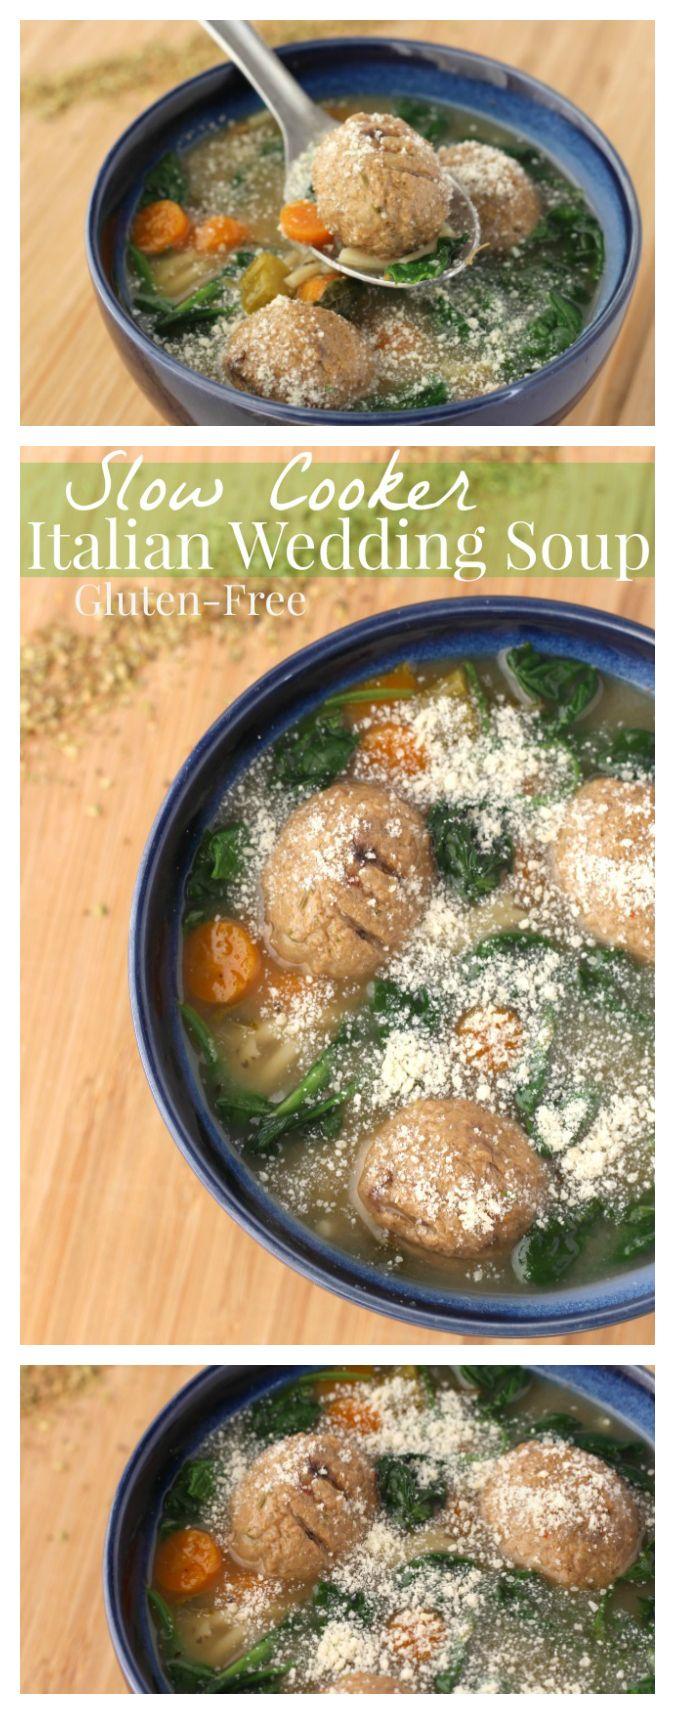 Gluten Free Crockpot Italian Wedding Soup Recipe